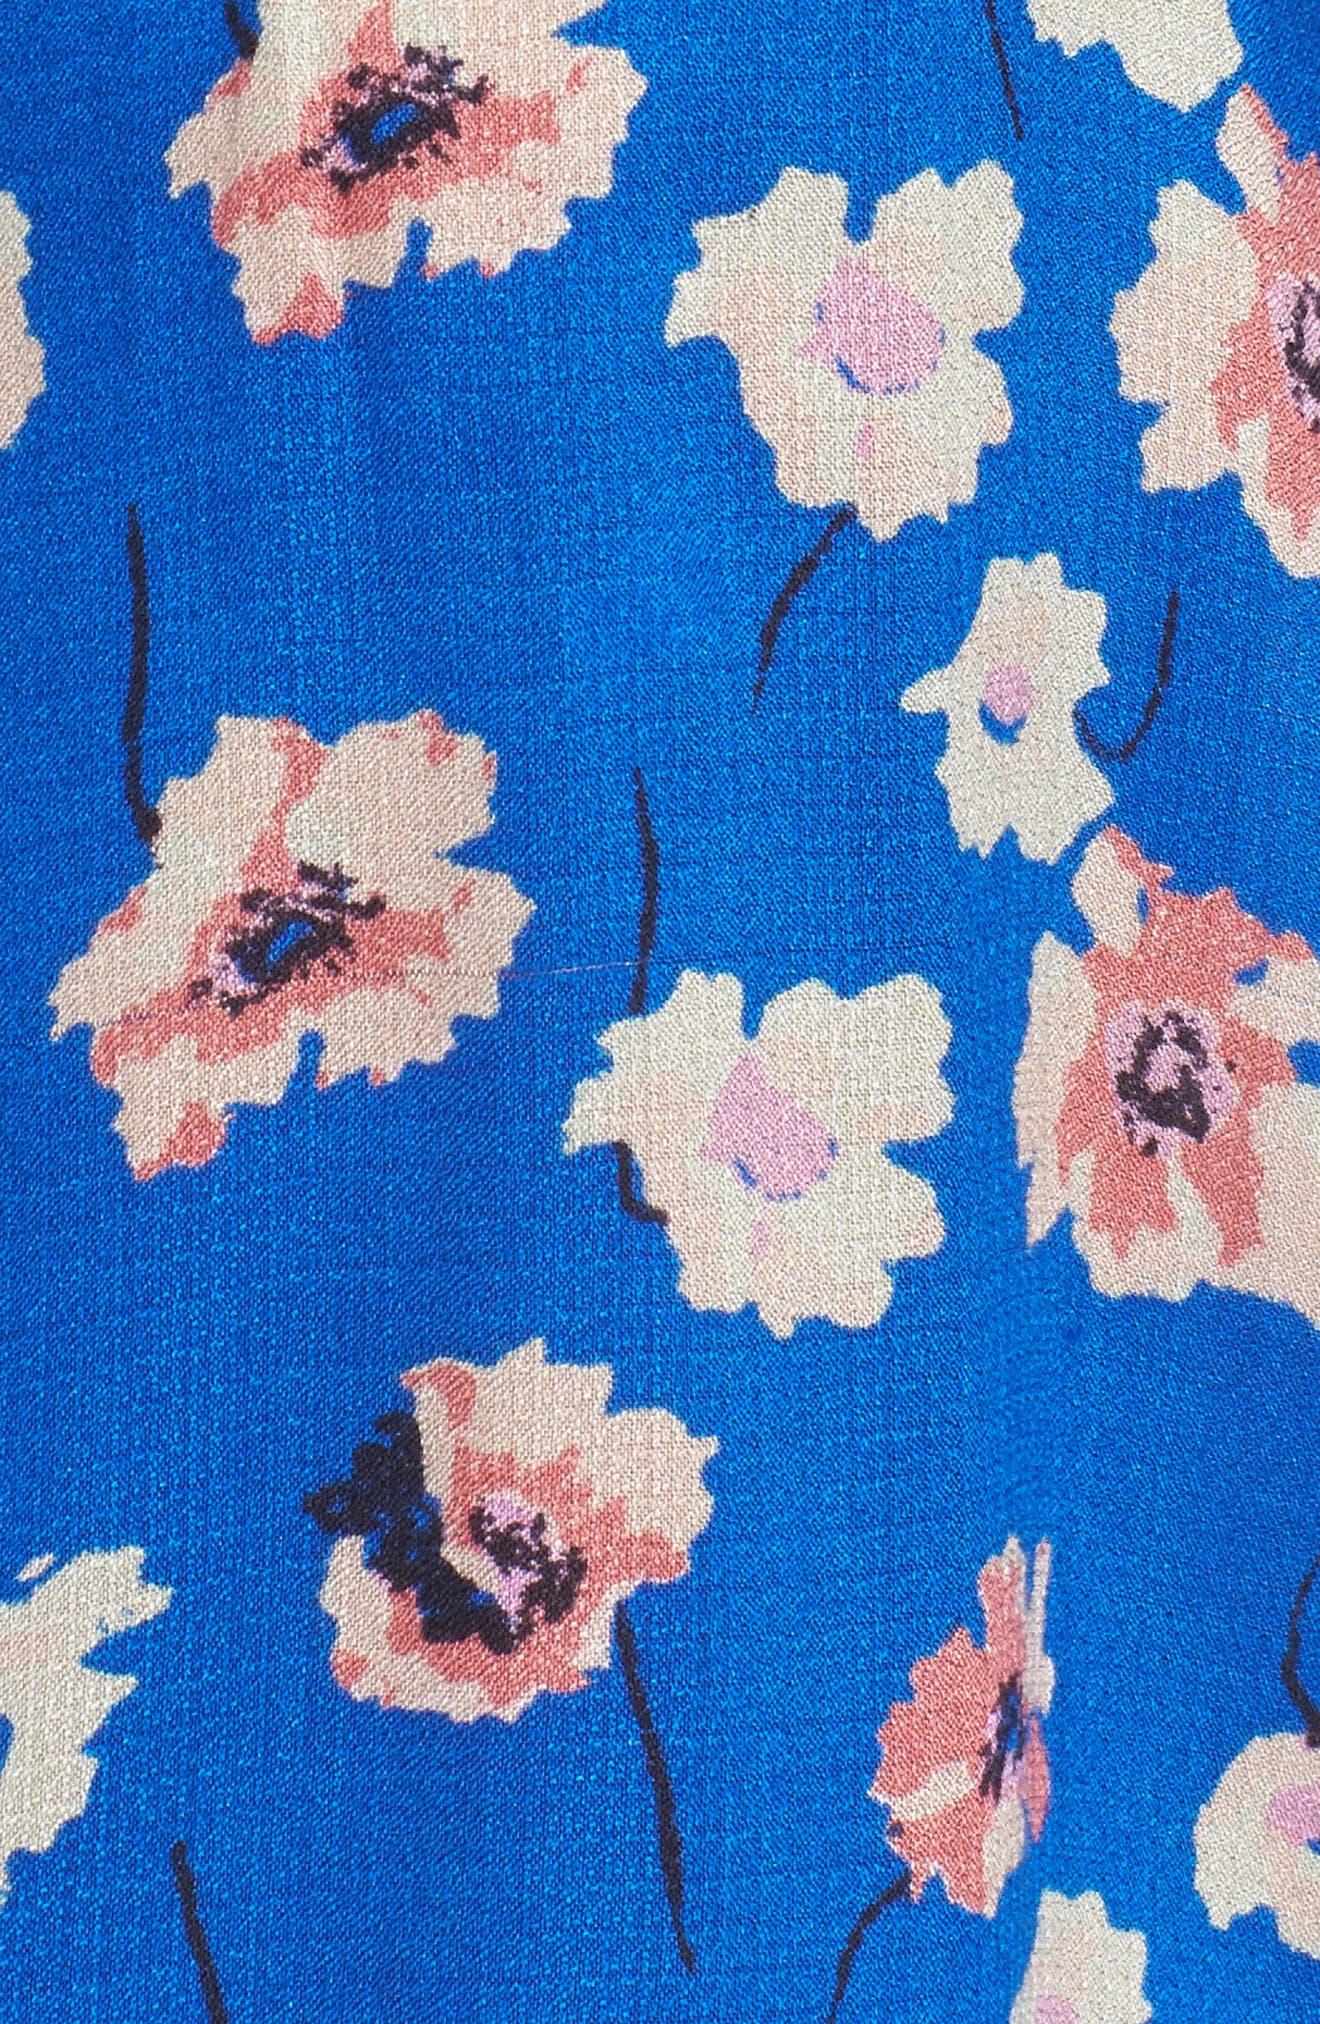 Split Sleeve Tie Neck Blouse,                             Alternate thumbnail 5, color,                             460